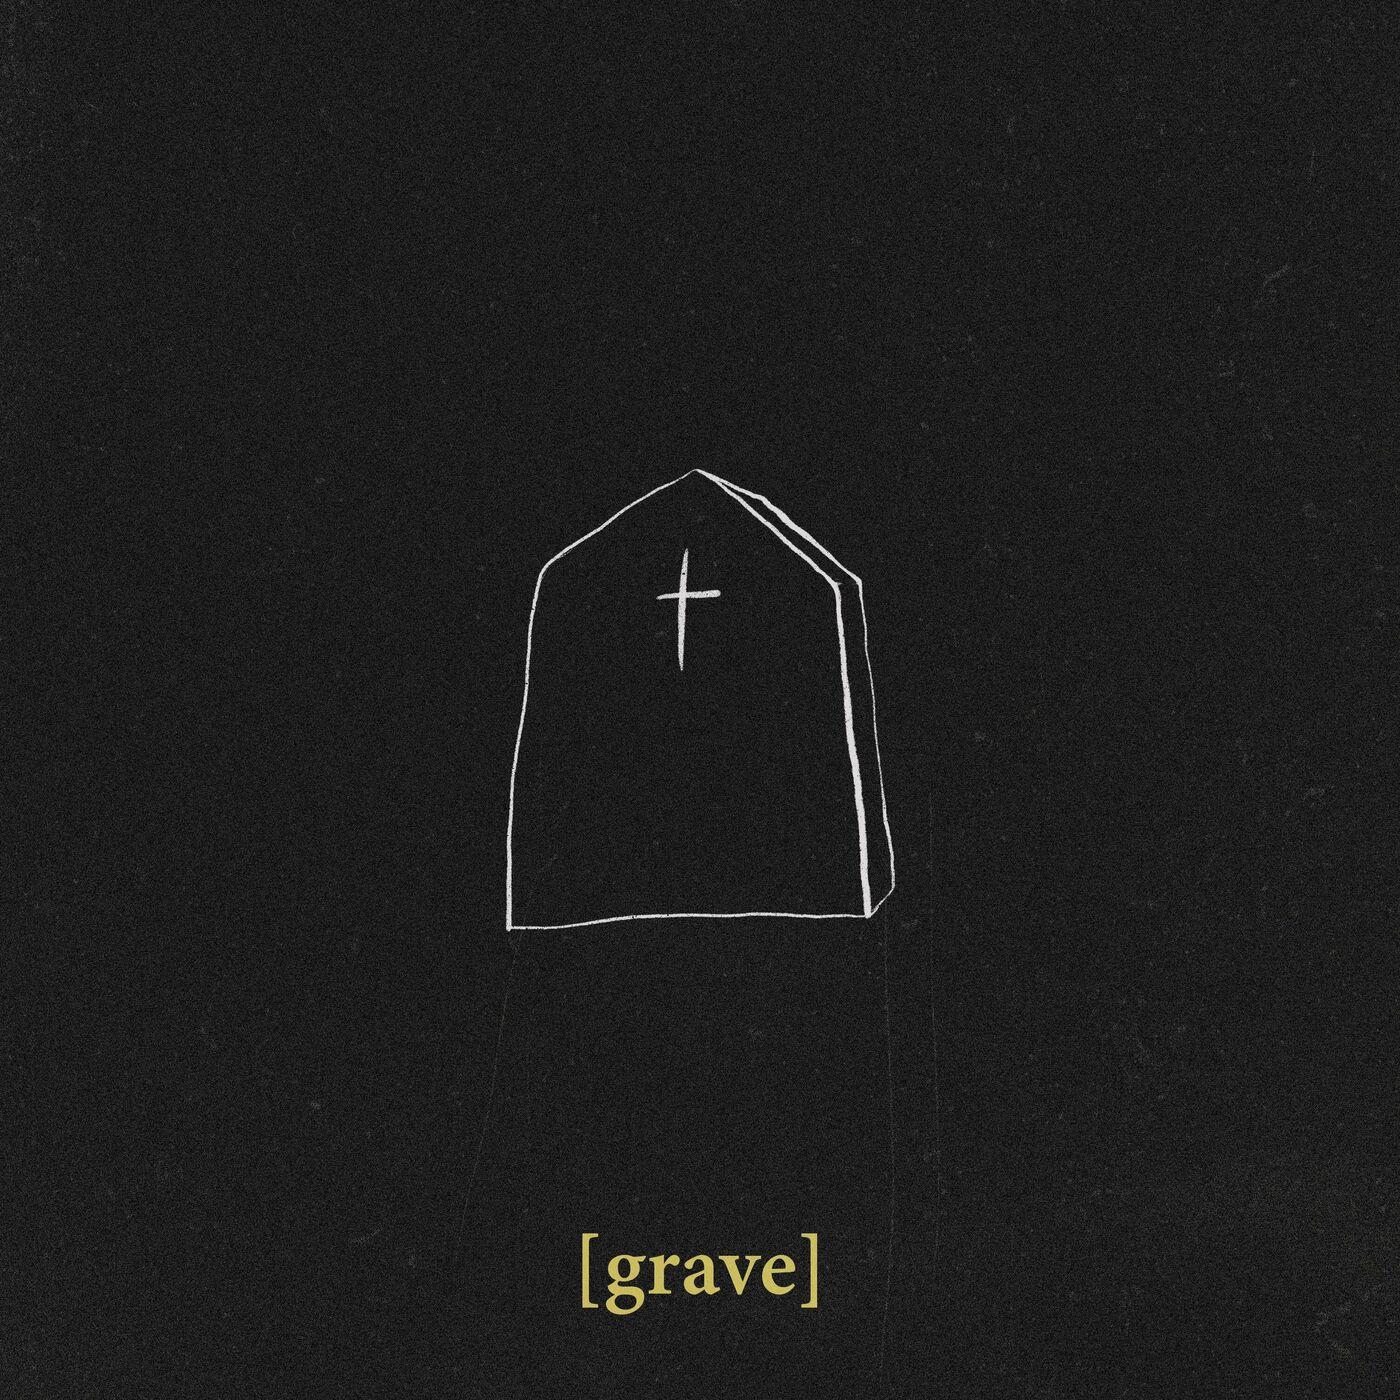 Through Arteries - Grave [single] (2020)